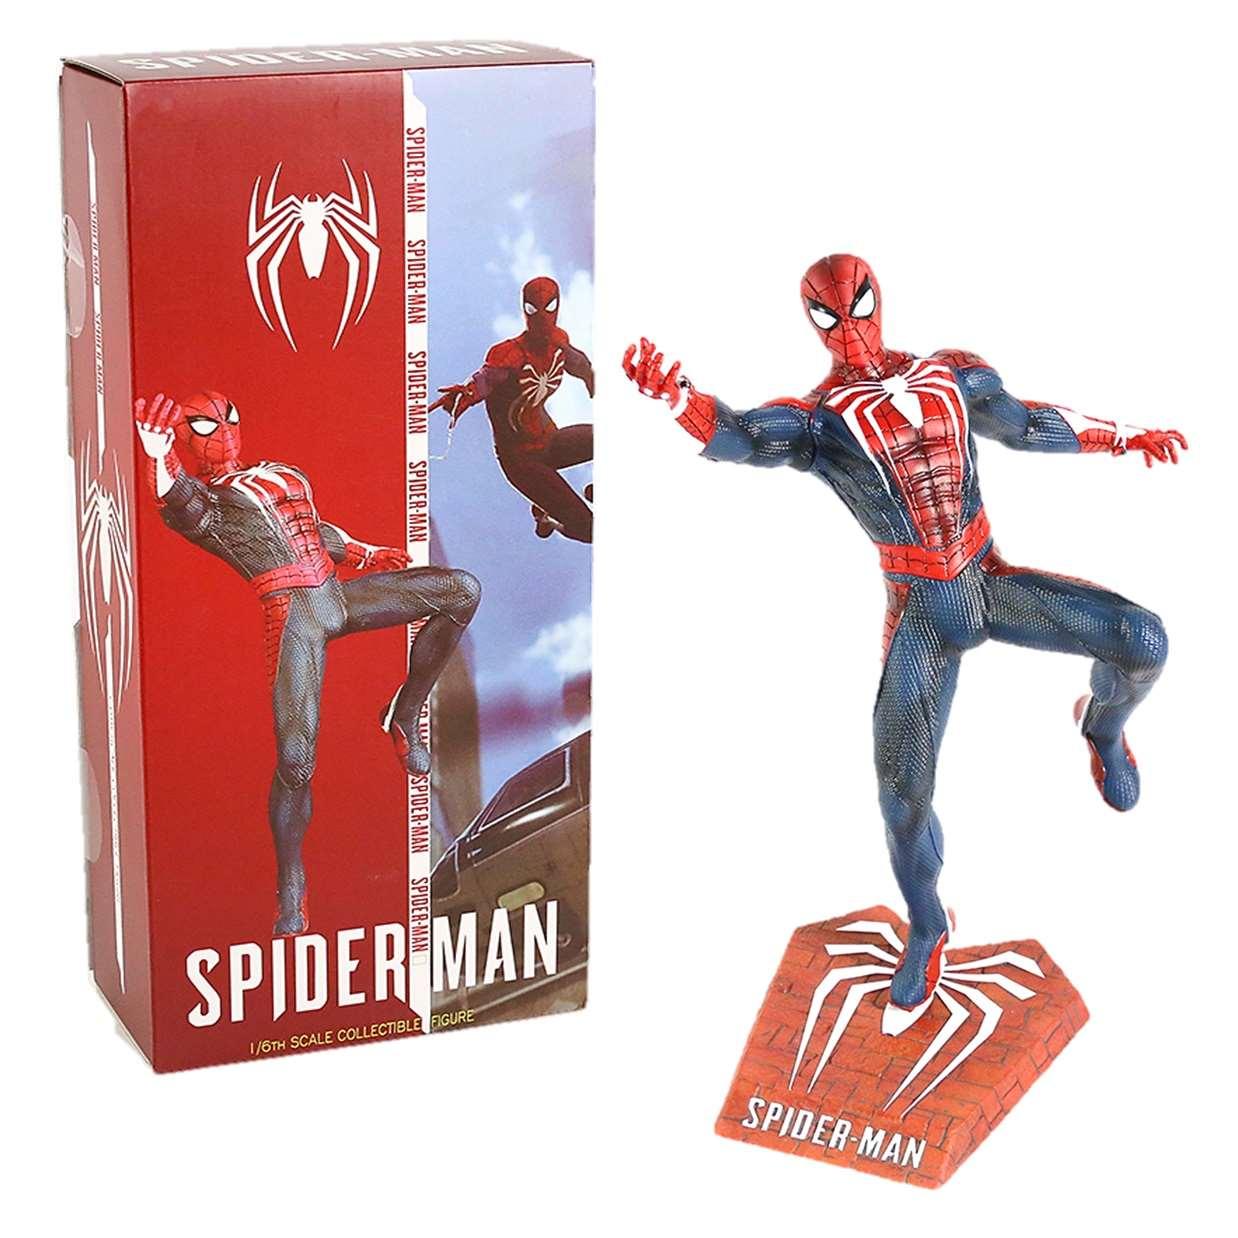 Spider Man Ps4 Escala 1/6 Estatua Team Of Prototyping 12puLG